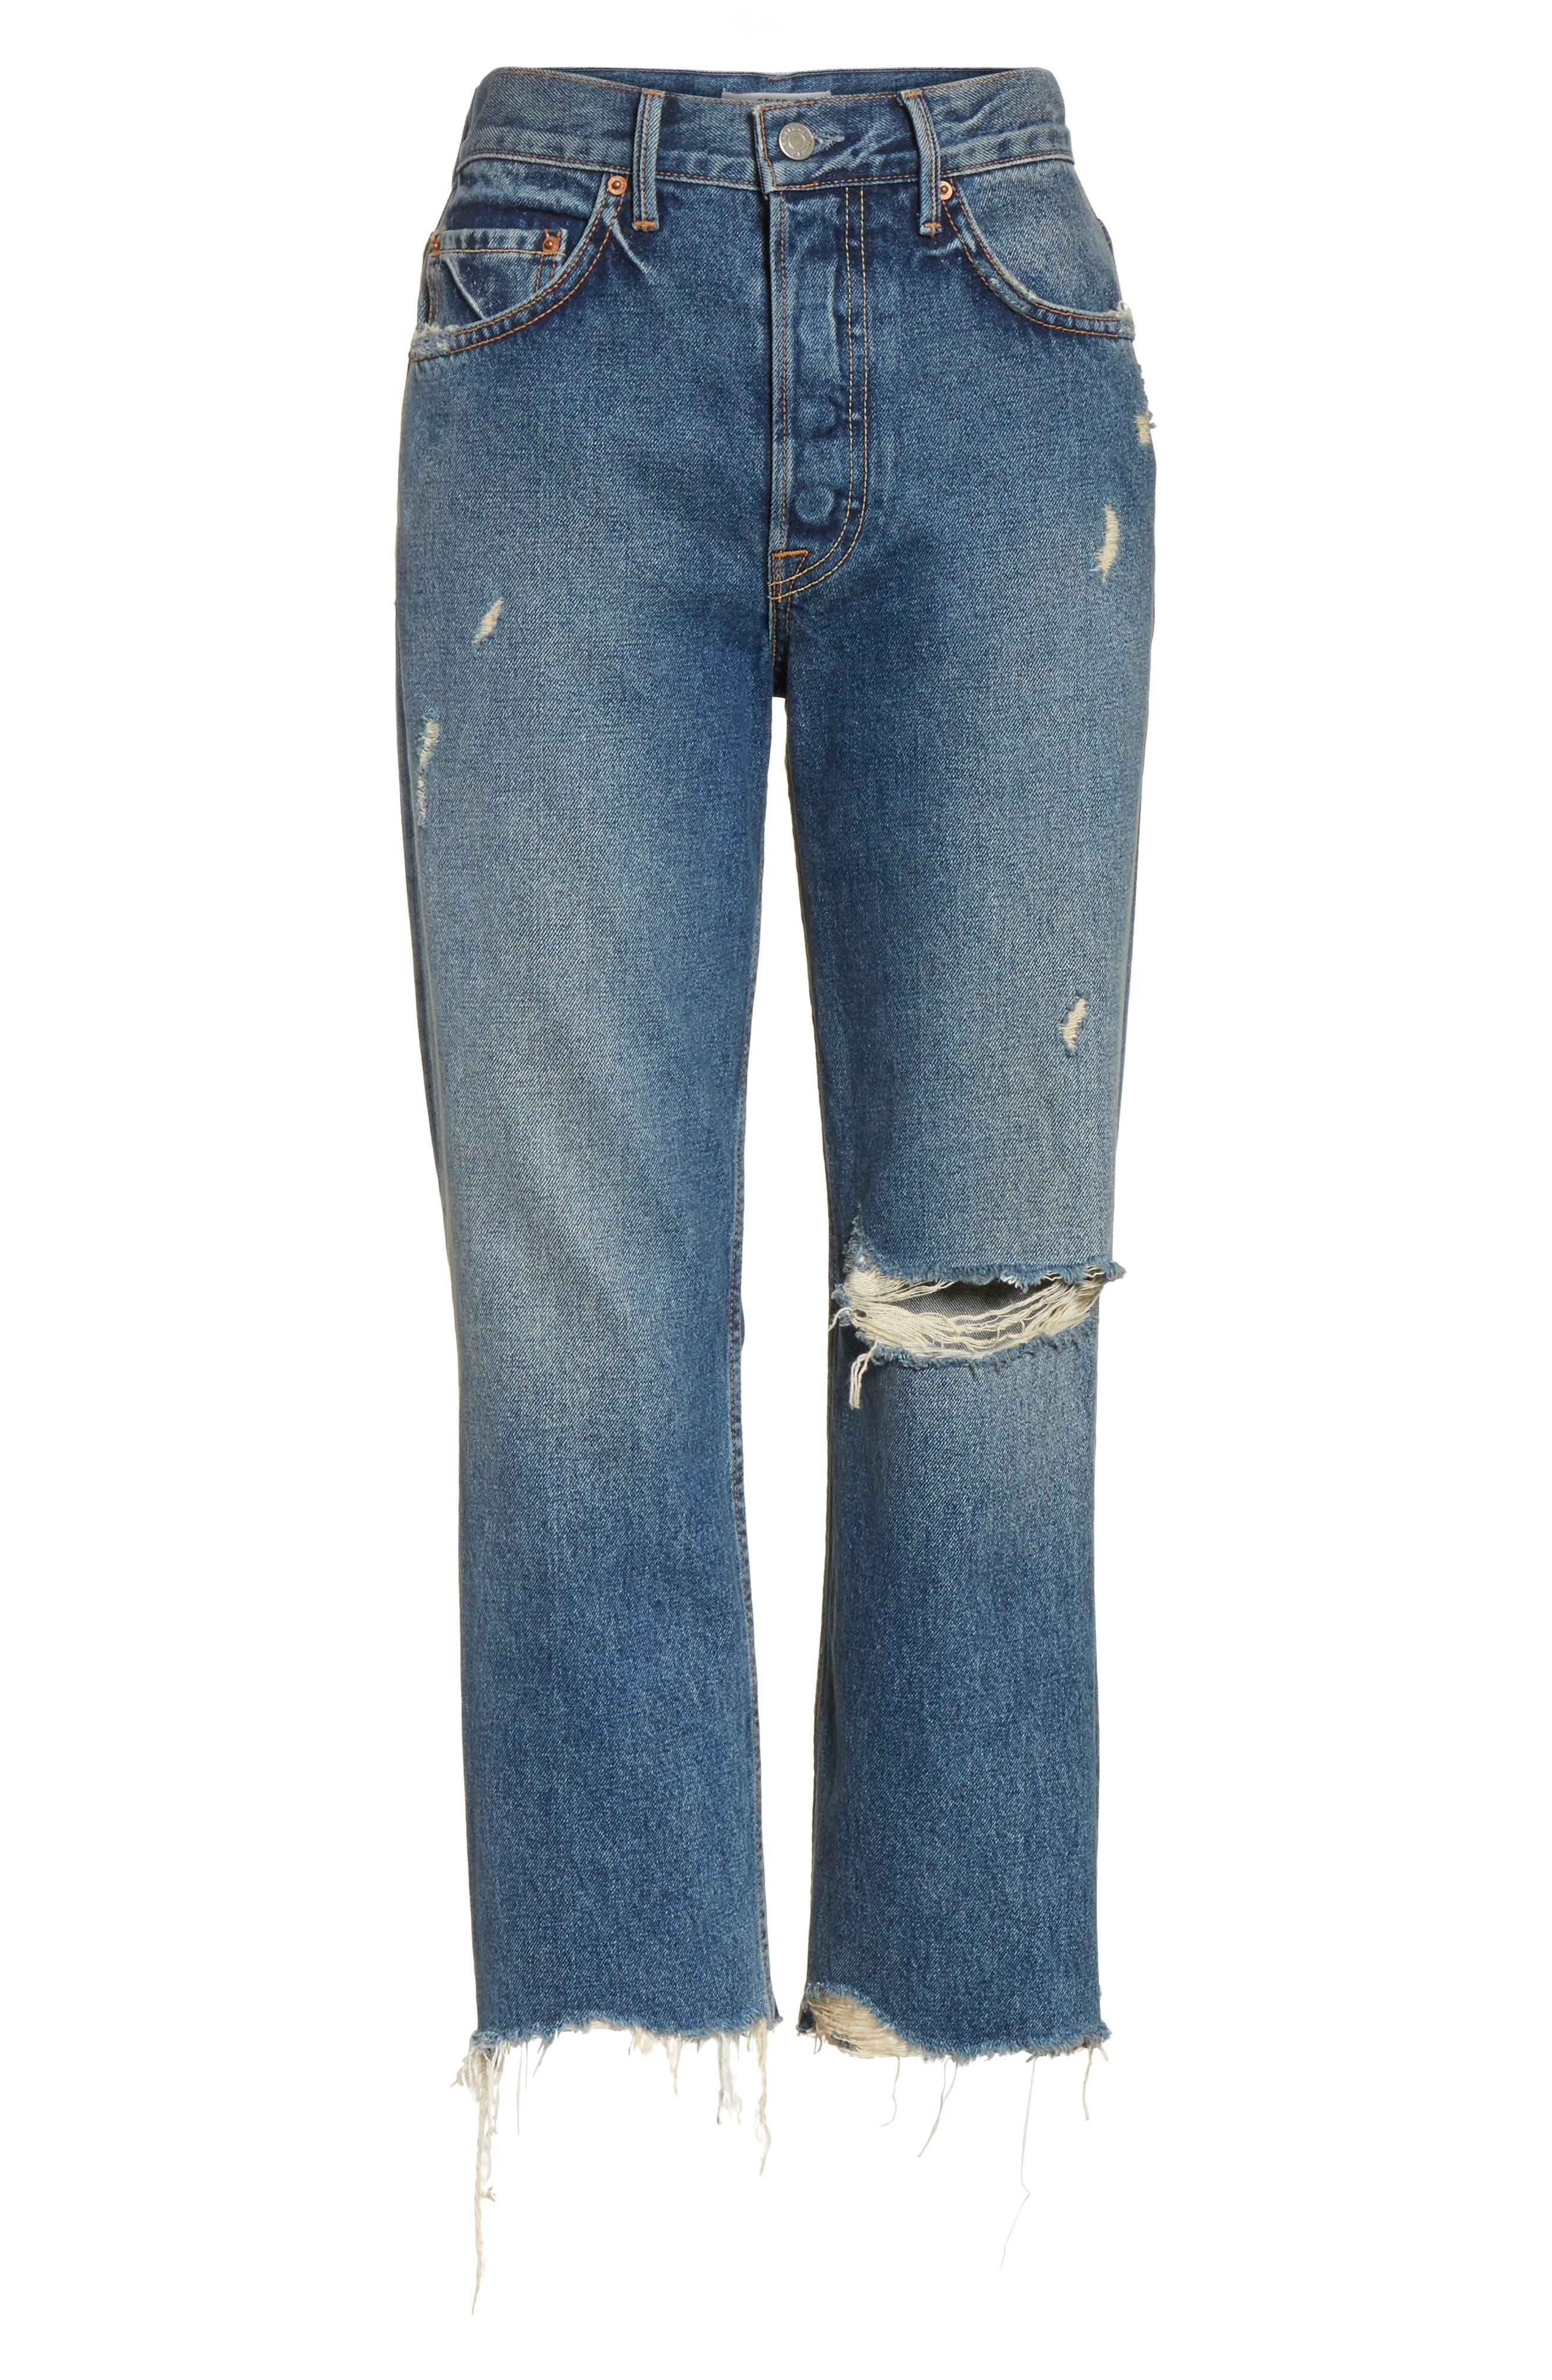 Linda Ripped Rigid High Waist Pop Crop Jeans,                             Alternate thumbnail 6, color,                             Zodiac